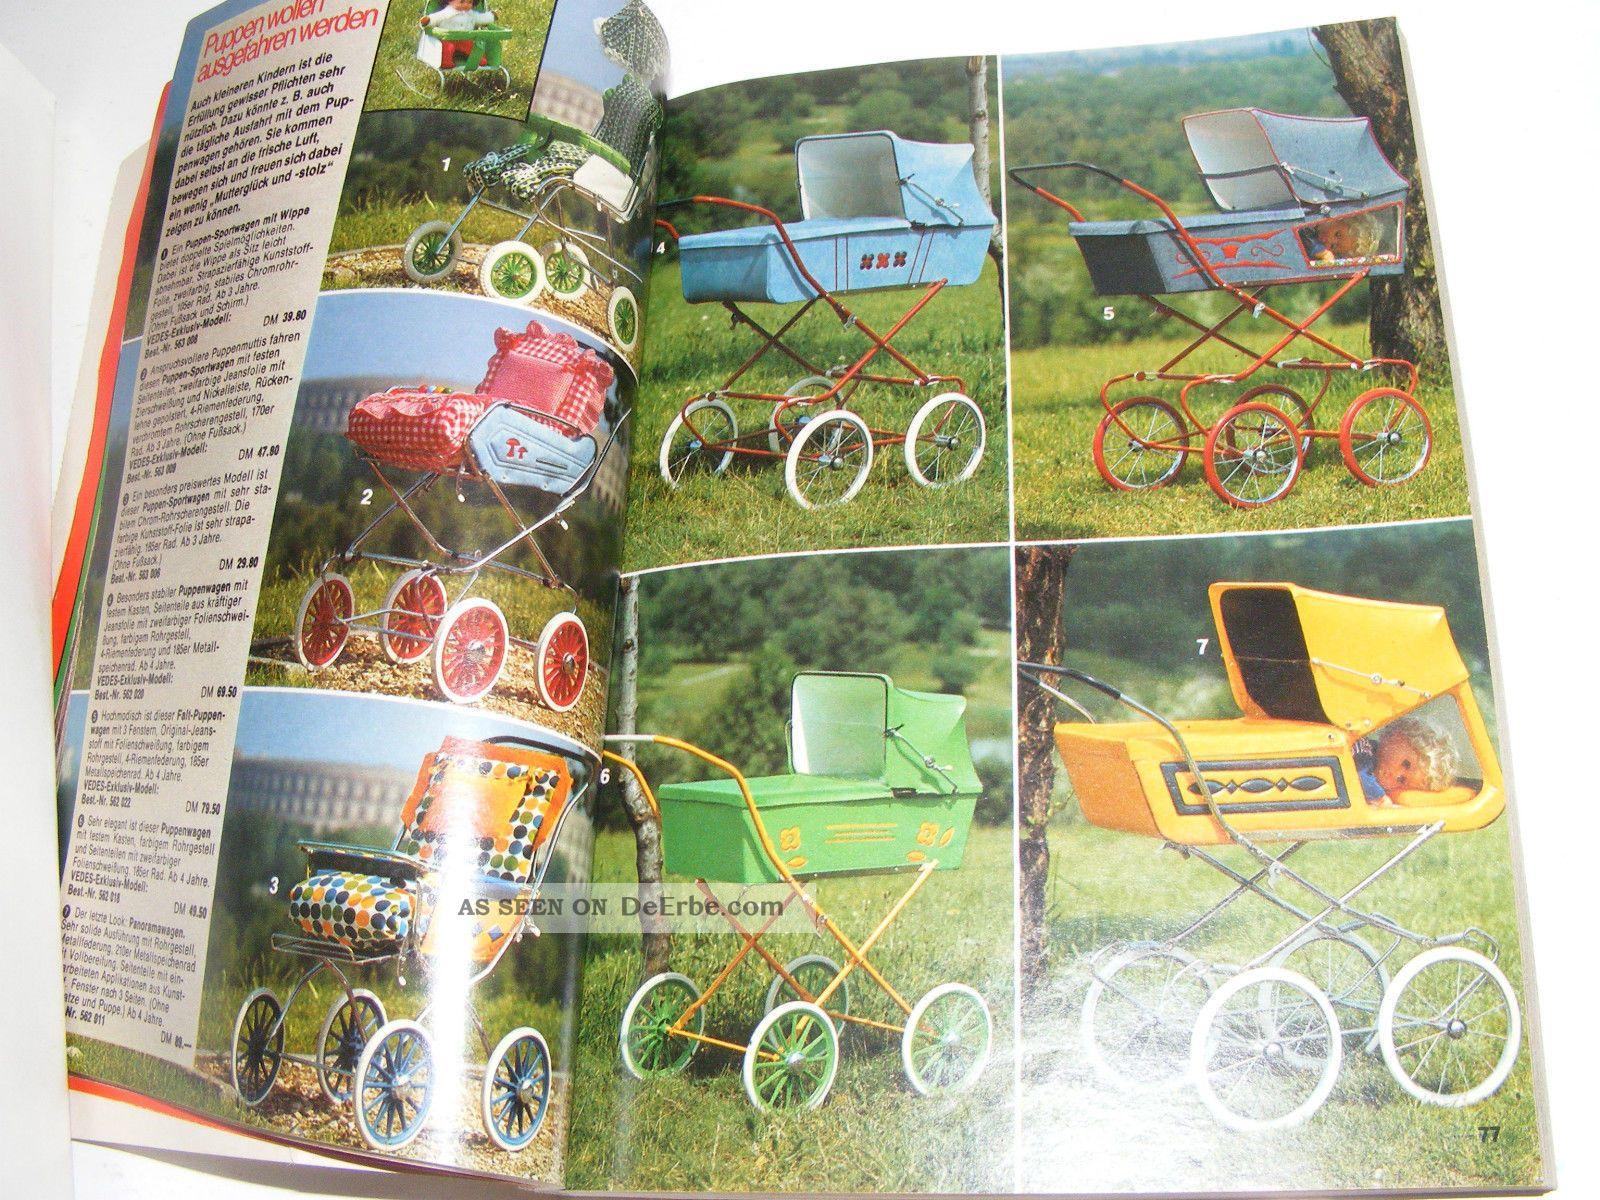 alter vedes spielzeug katalog 1974 carrera bigjim lego barbie m rklin 256 seiten. Black Bedroom Furniture Sets. Home Design Ideas